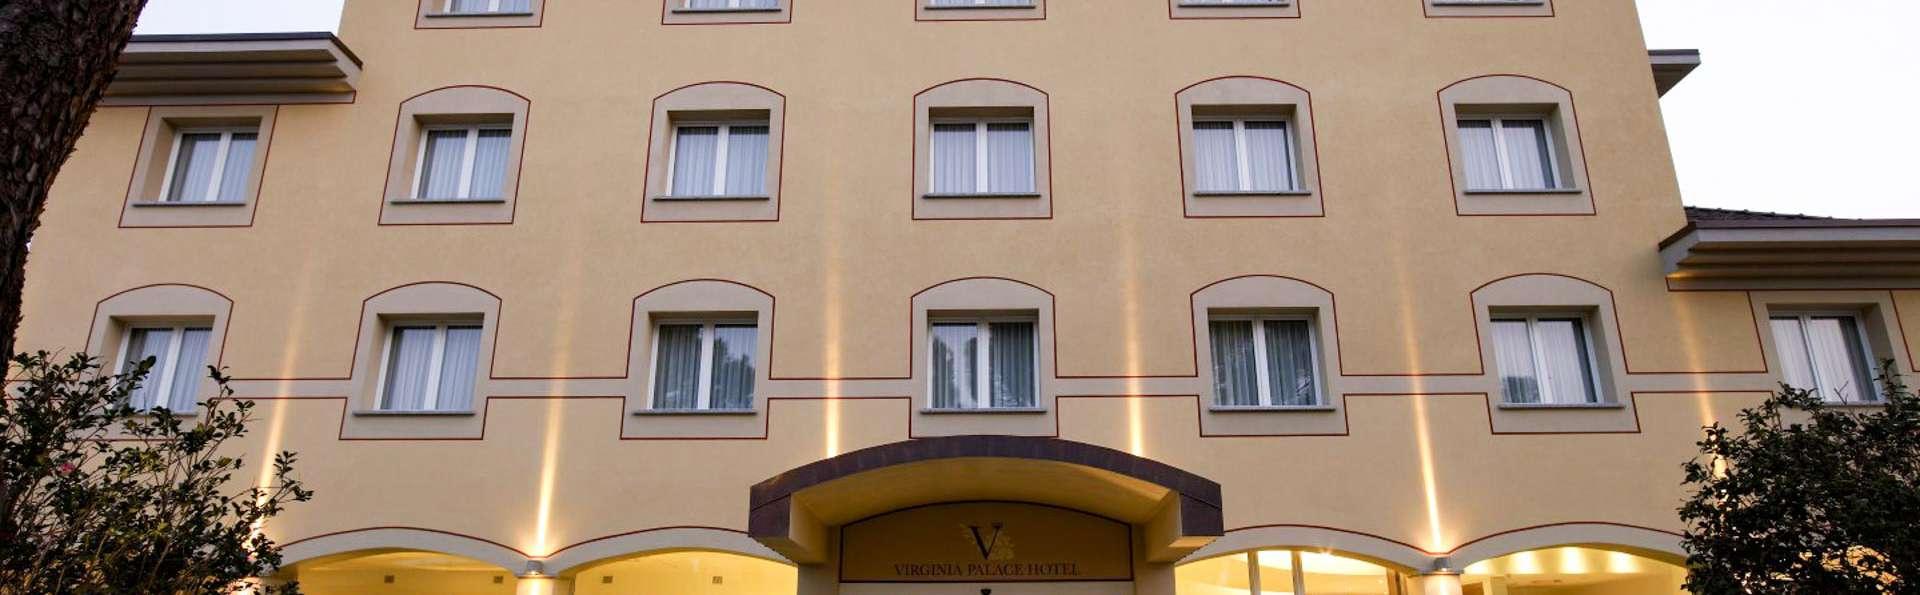 Virginia Palace Hotel - EDIT_FRONT_02.jpg